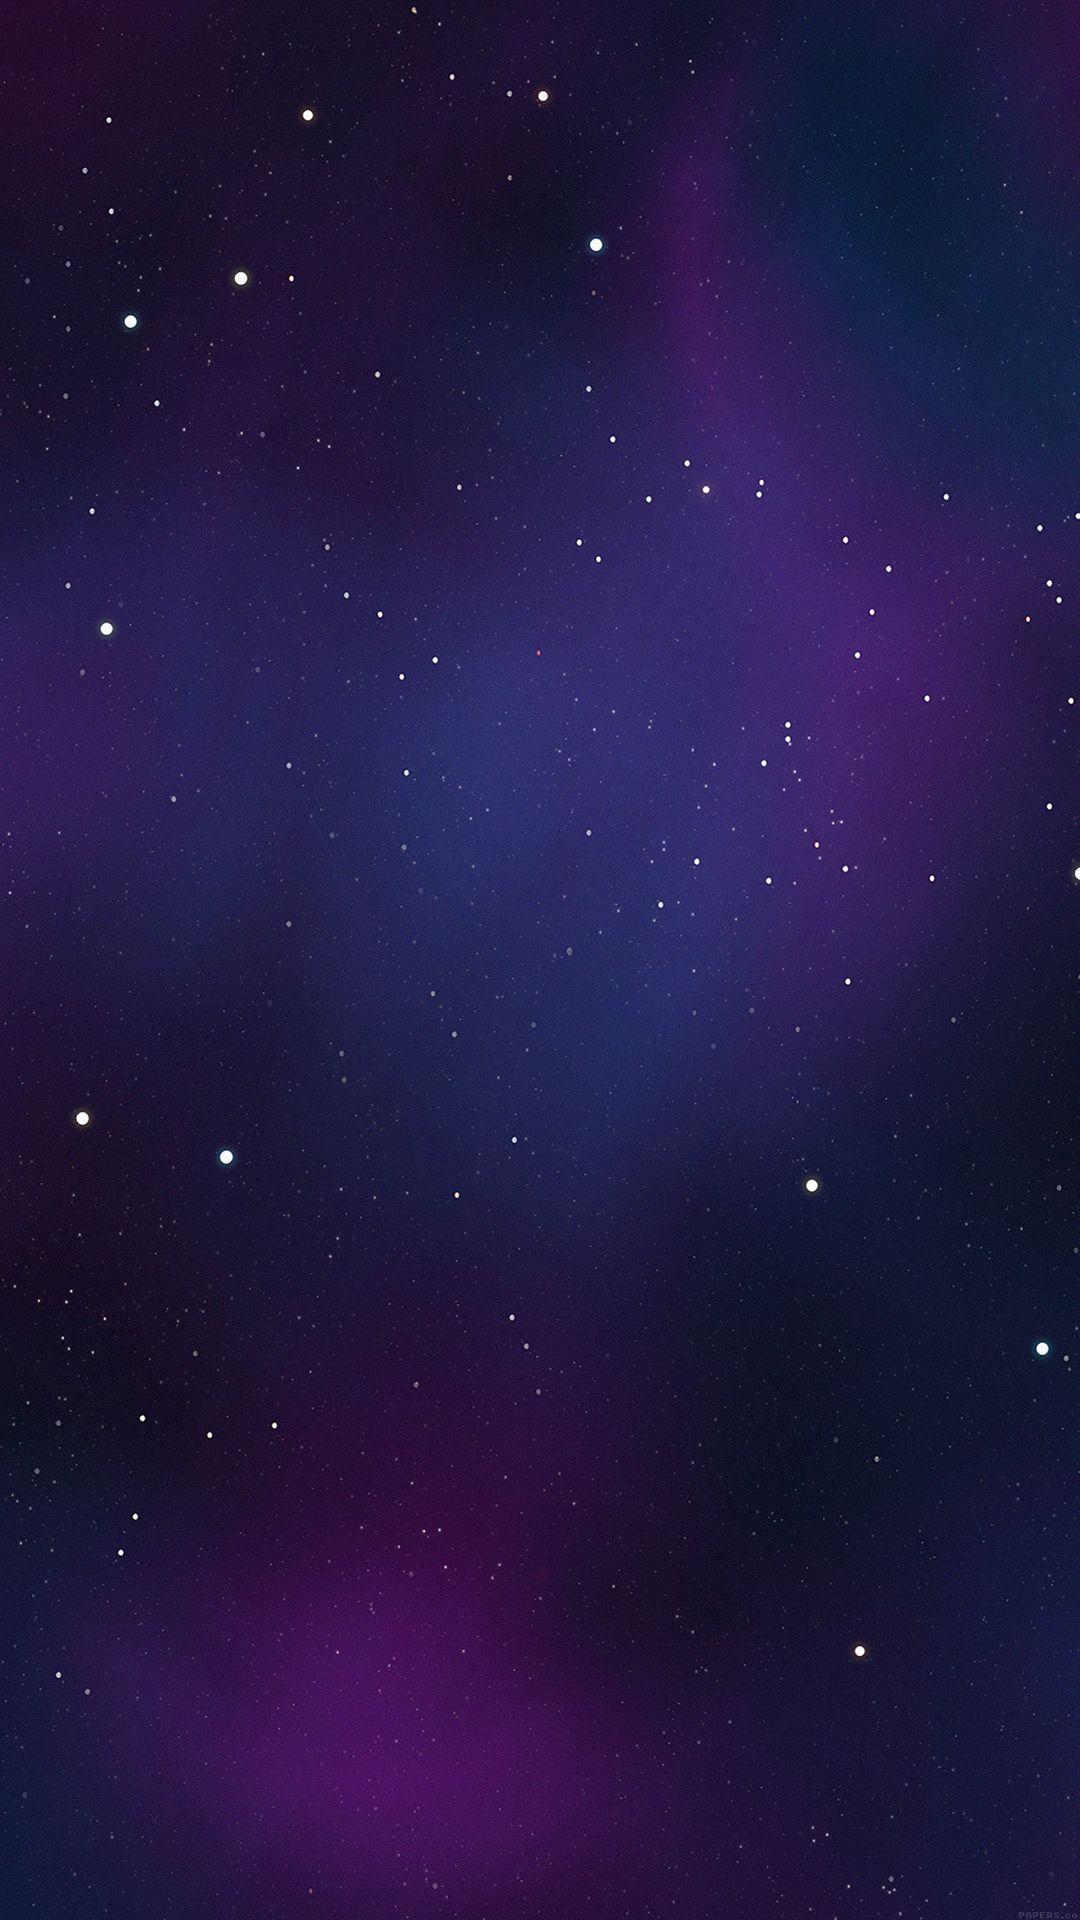 Dark Purple Iphone Wallpapers Top Free Dark Purple Iphone Backgrounds Wallpaperaccess